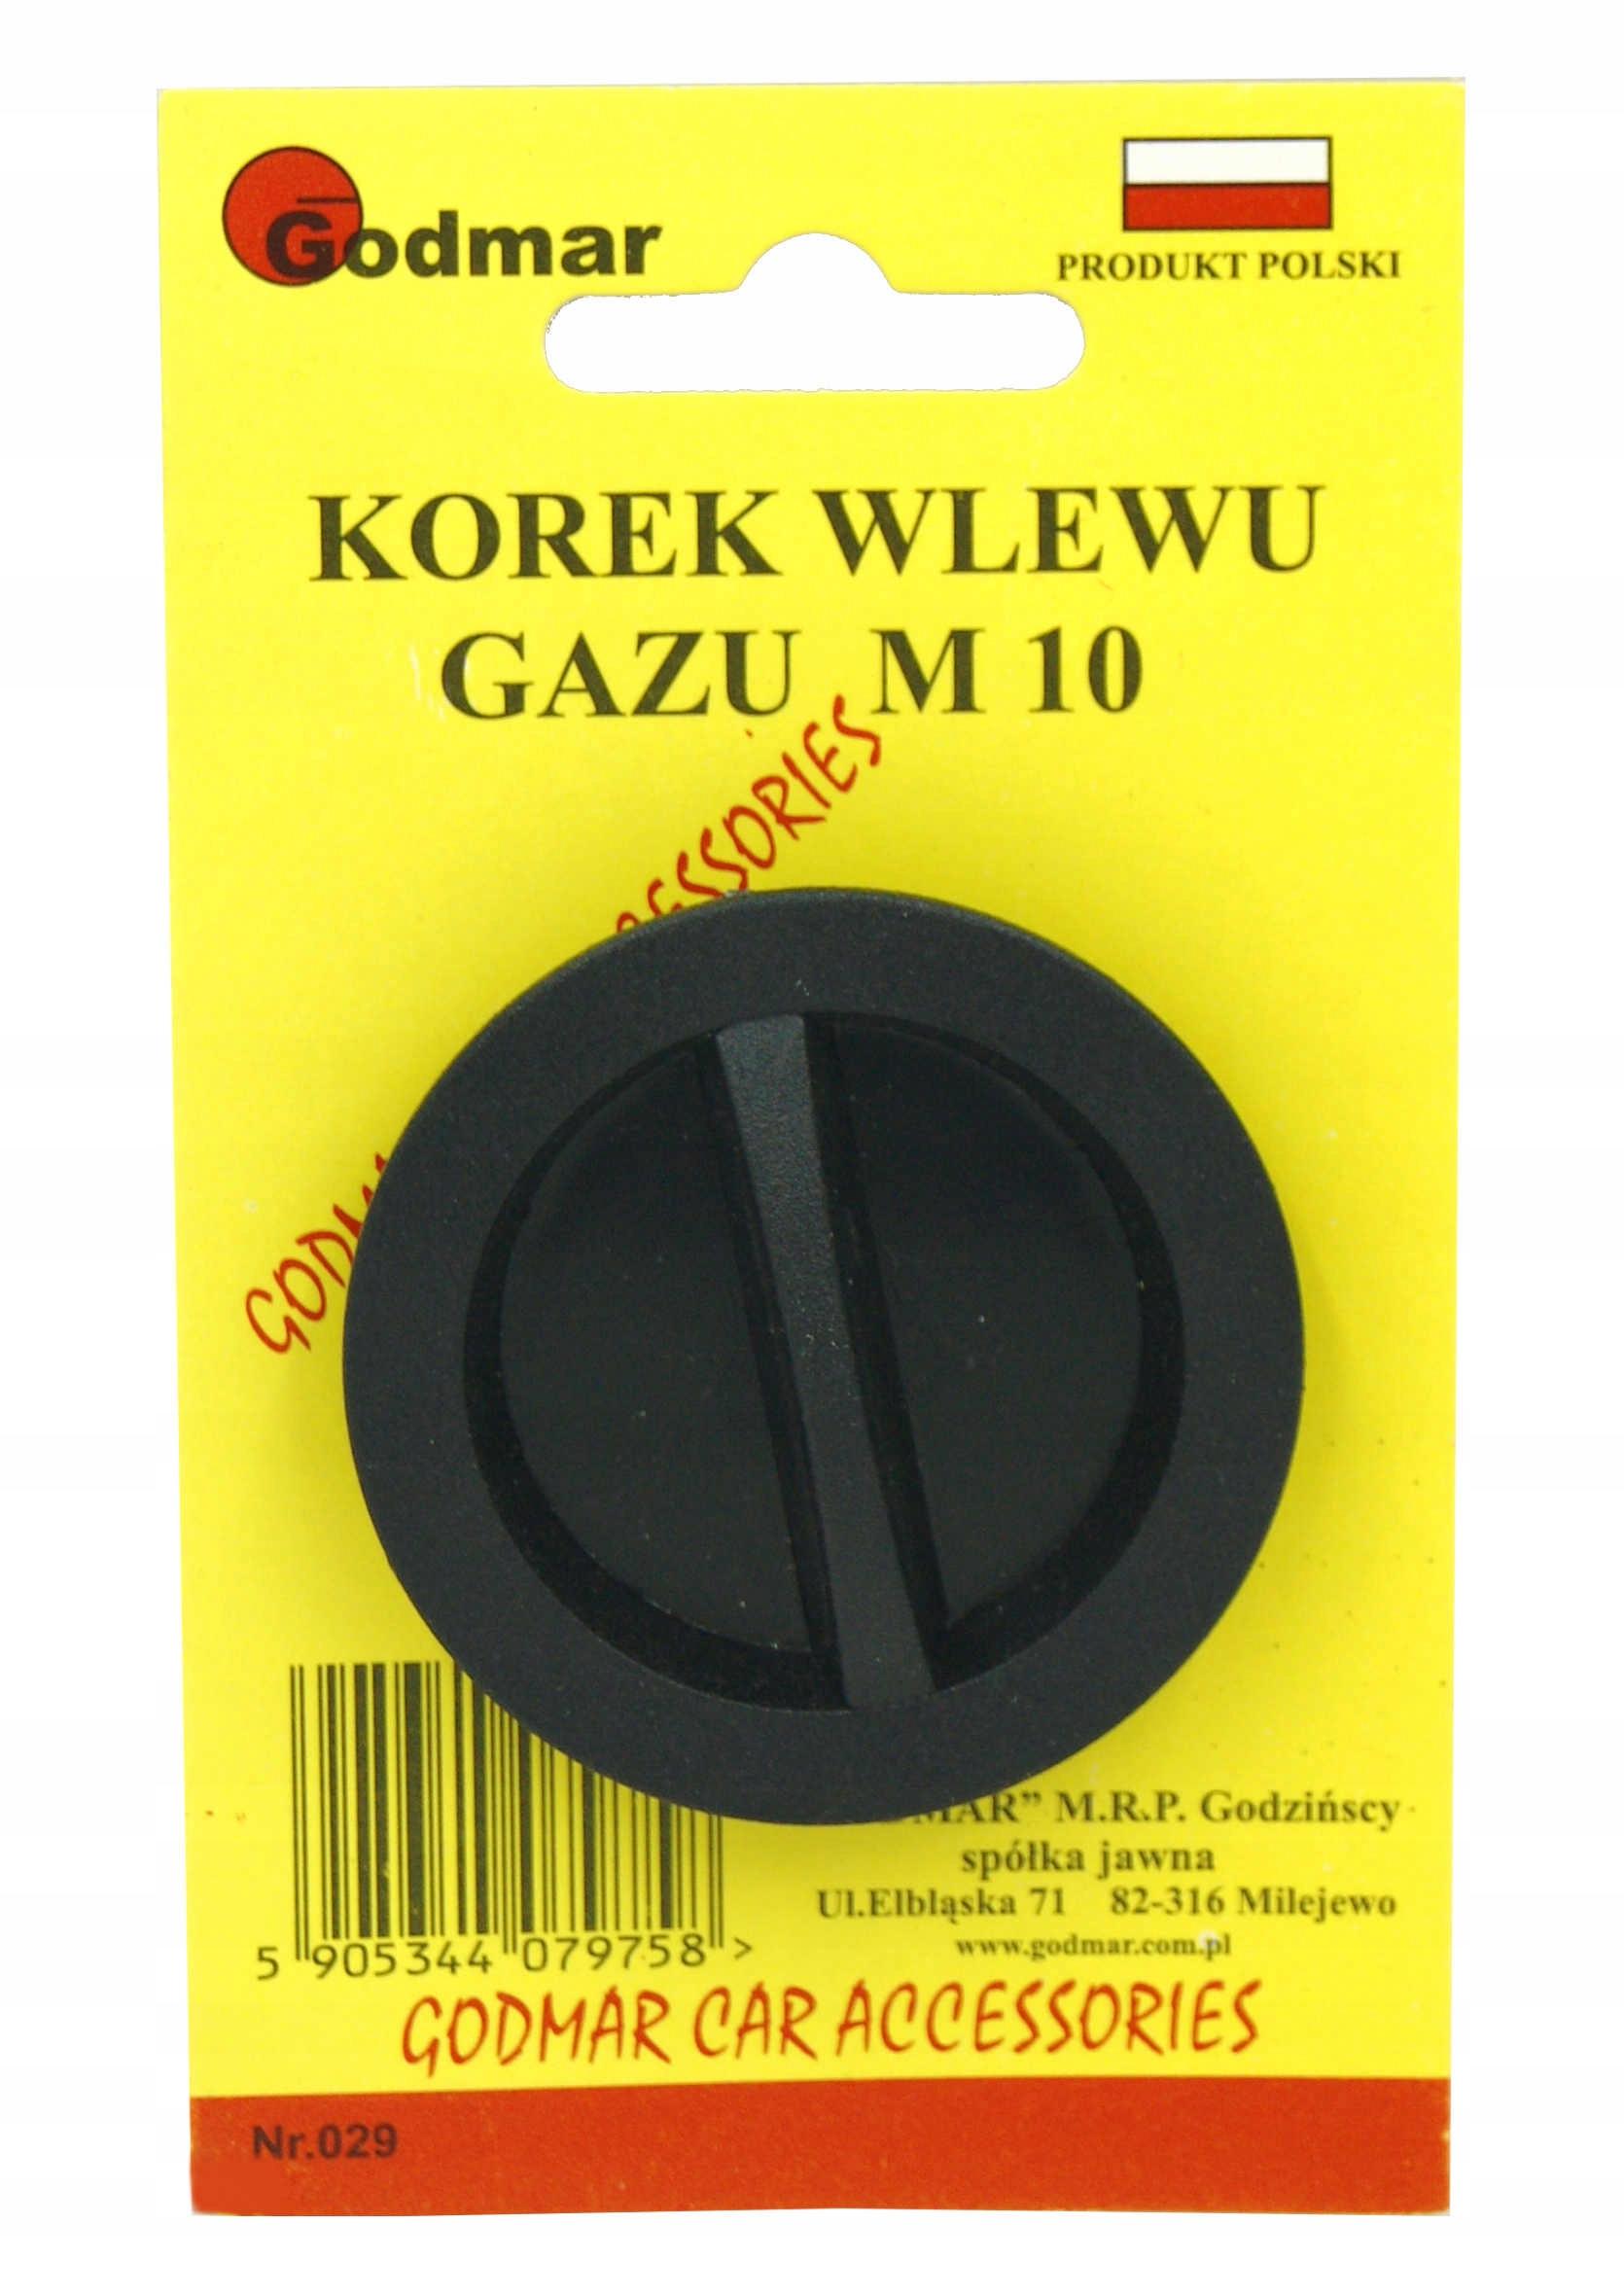 пробка заглушка настой газа заглушка 10 мм снг m-10